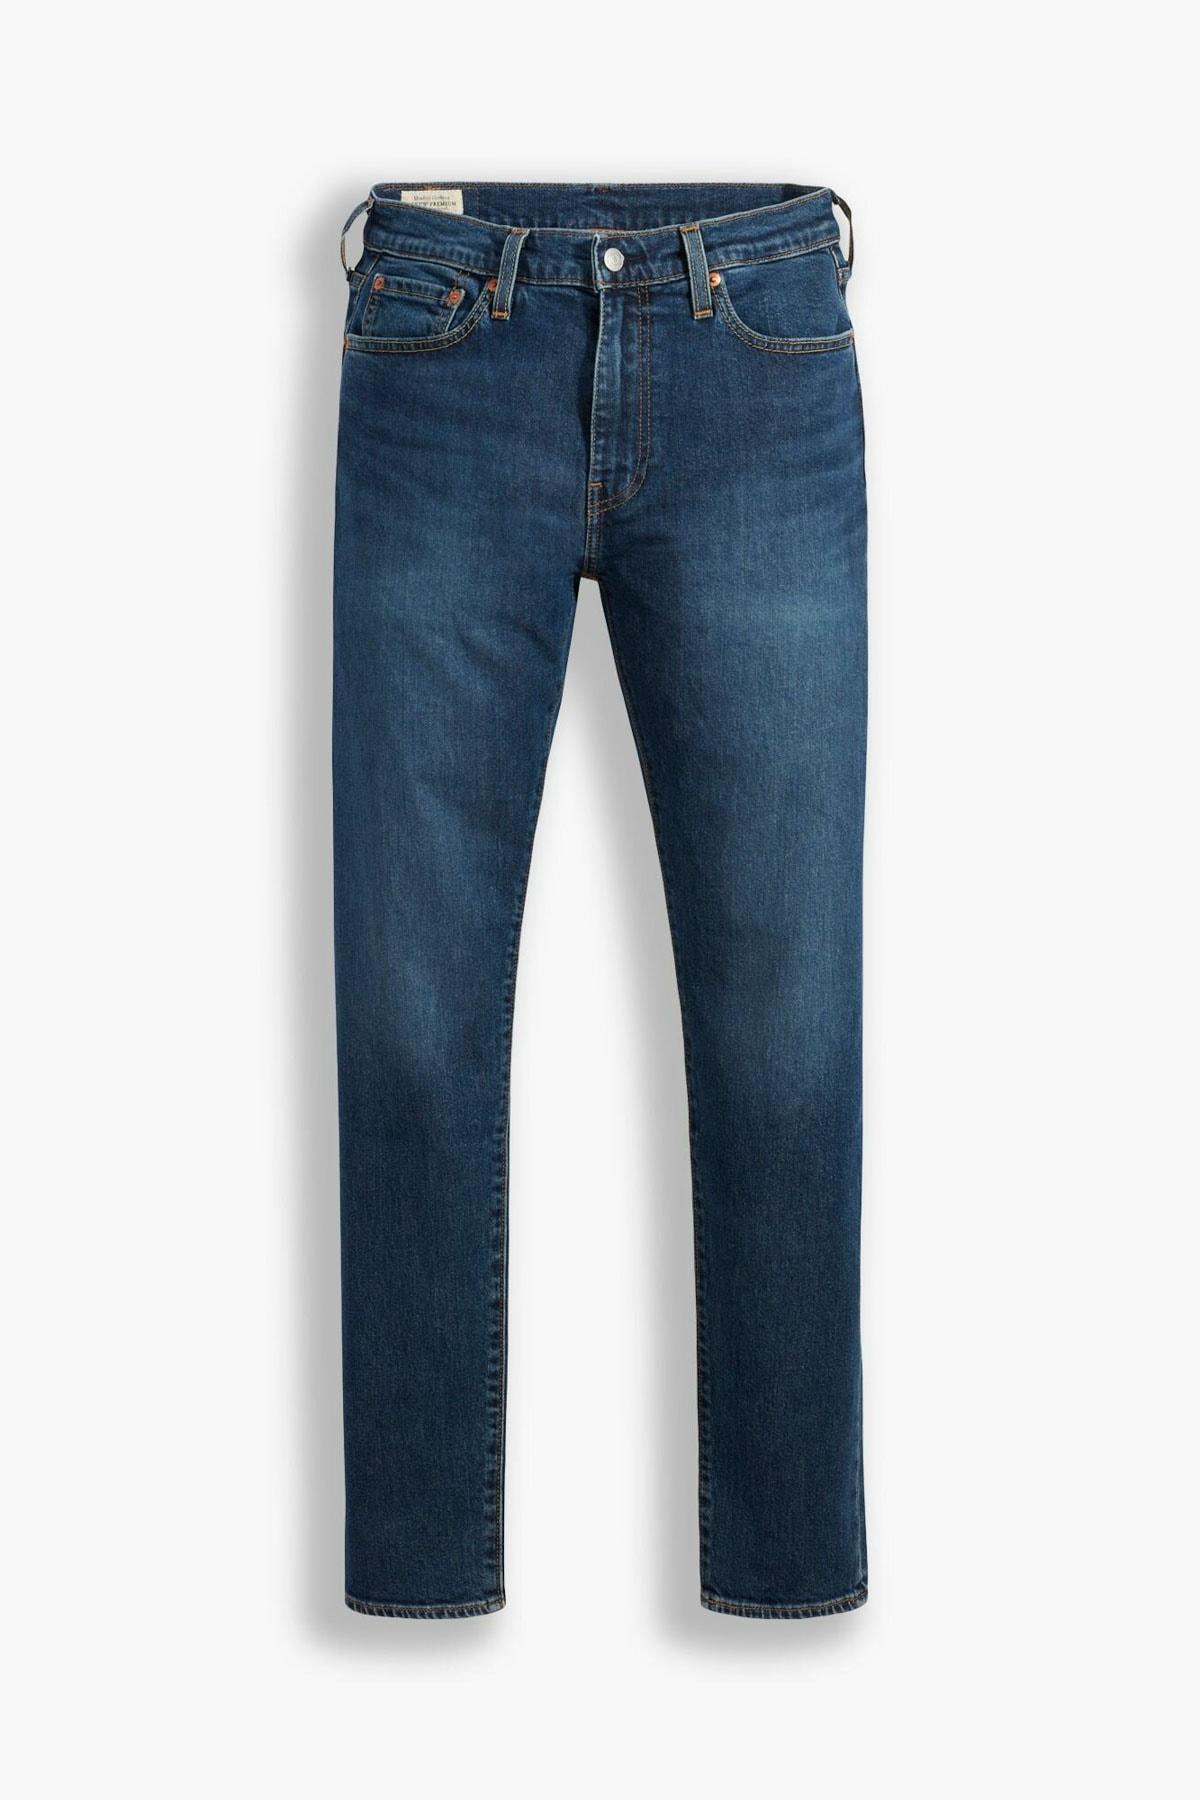 Erkek 512™ Slim Taper Erkek Jean Pantolon-X9990 Lse_Paros Late Knights Adv 2883309180